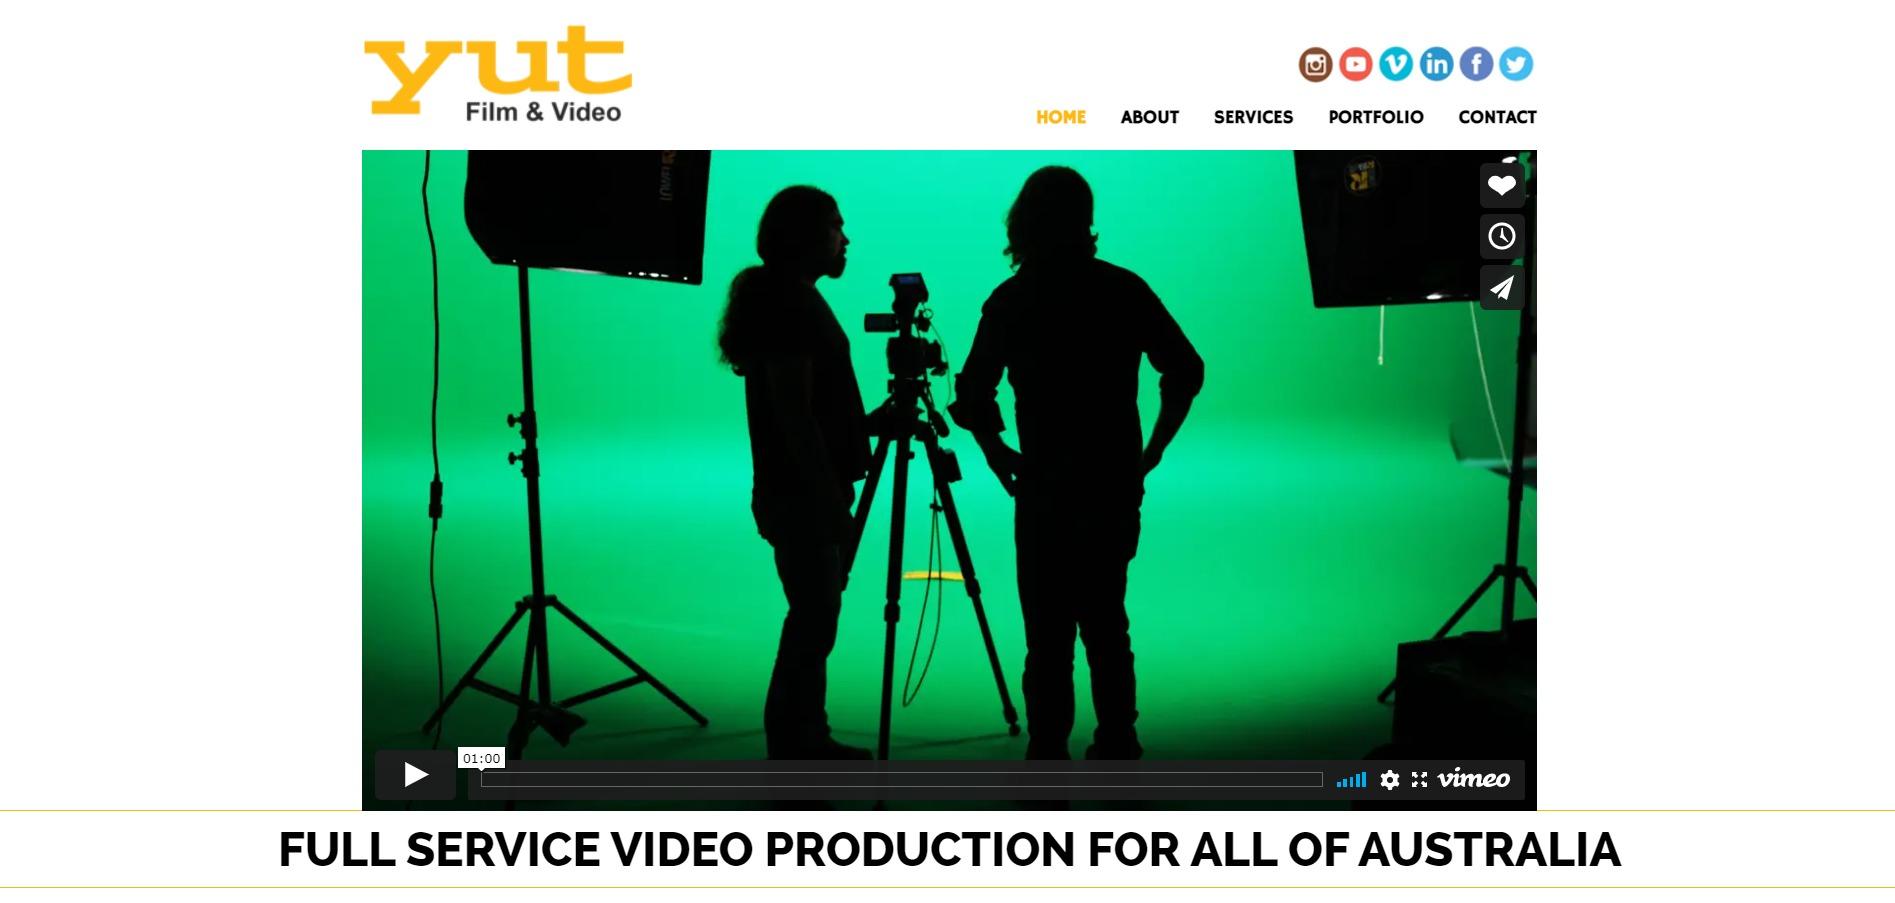 Yut Film & Video